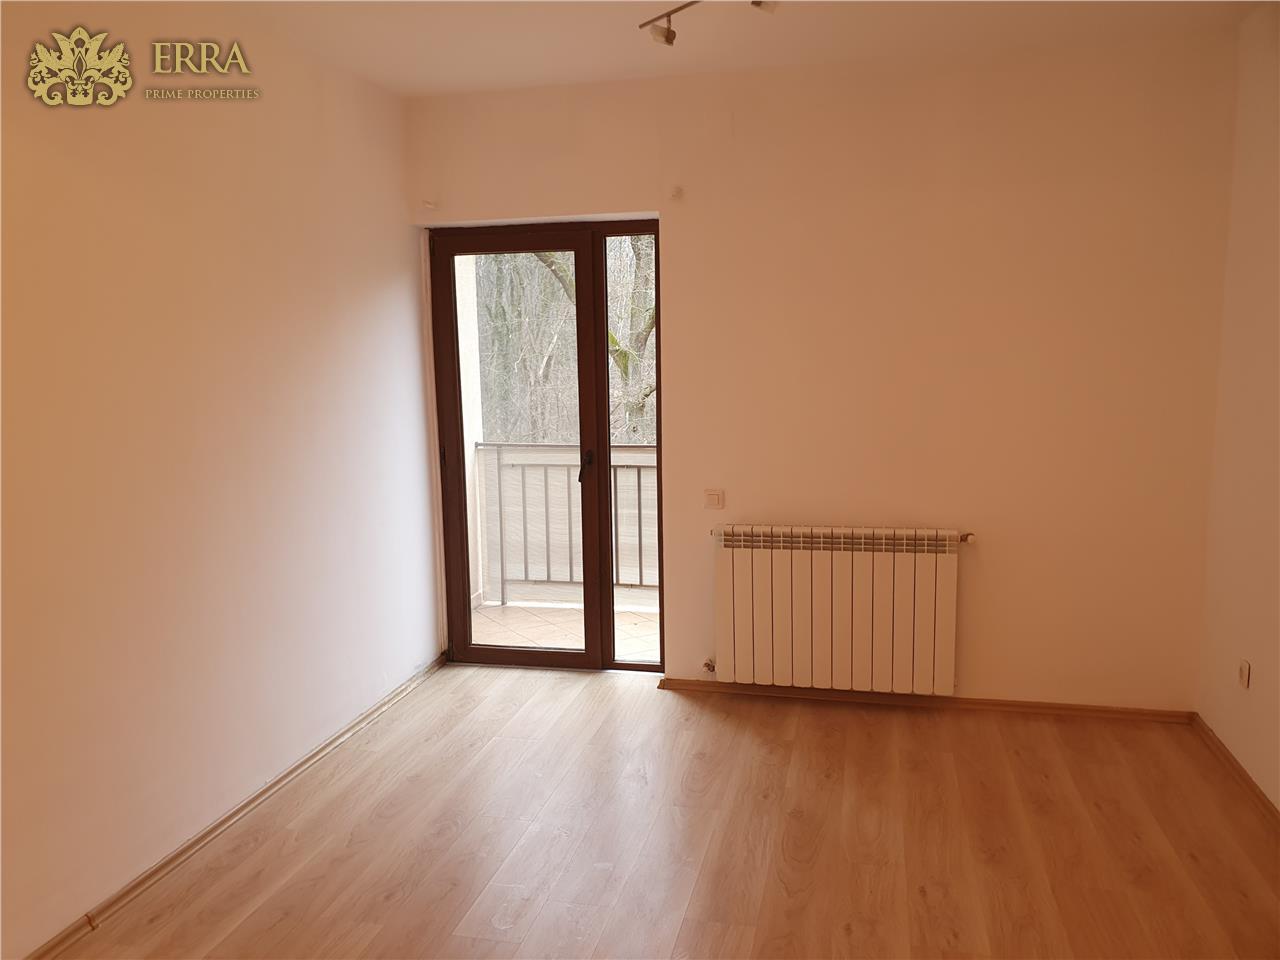 Apartament cu vedere la padure!!! Baneasa